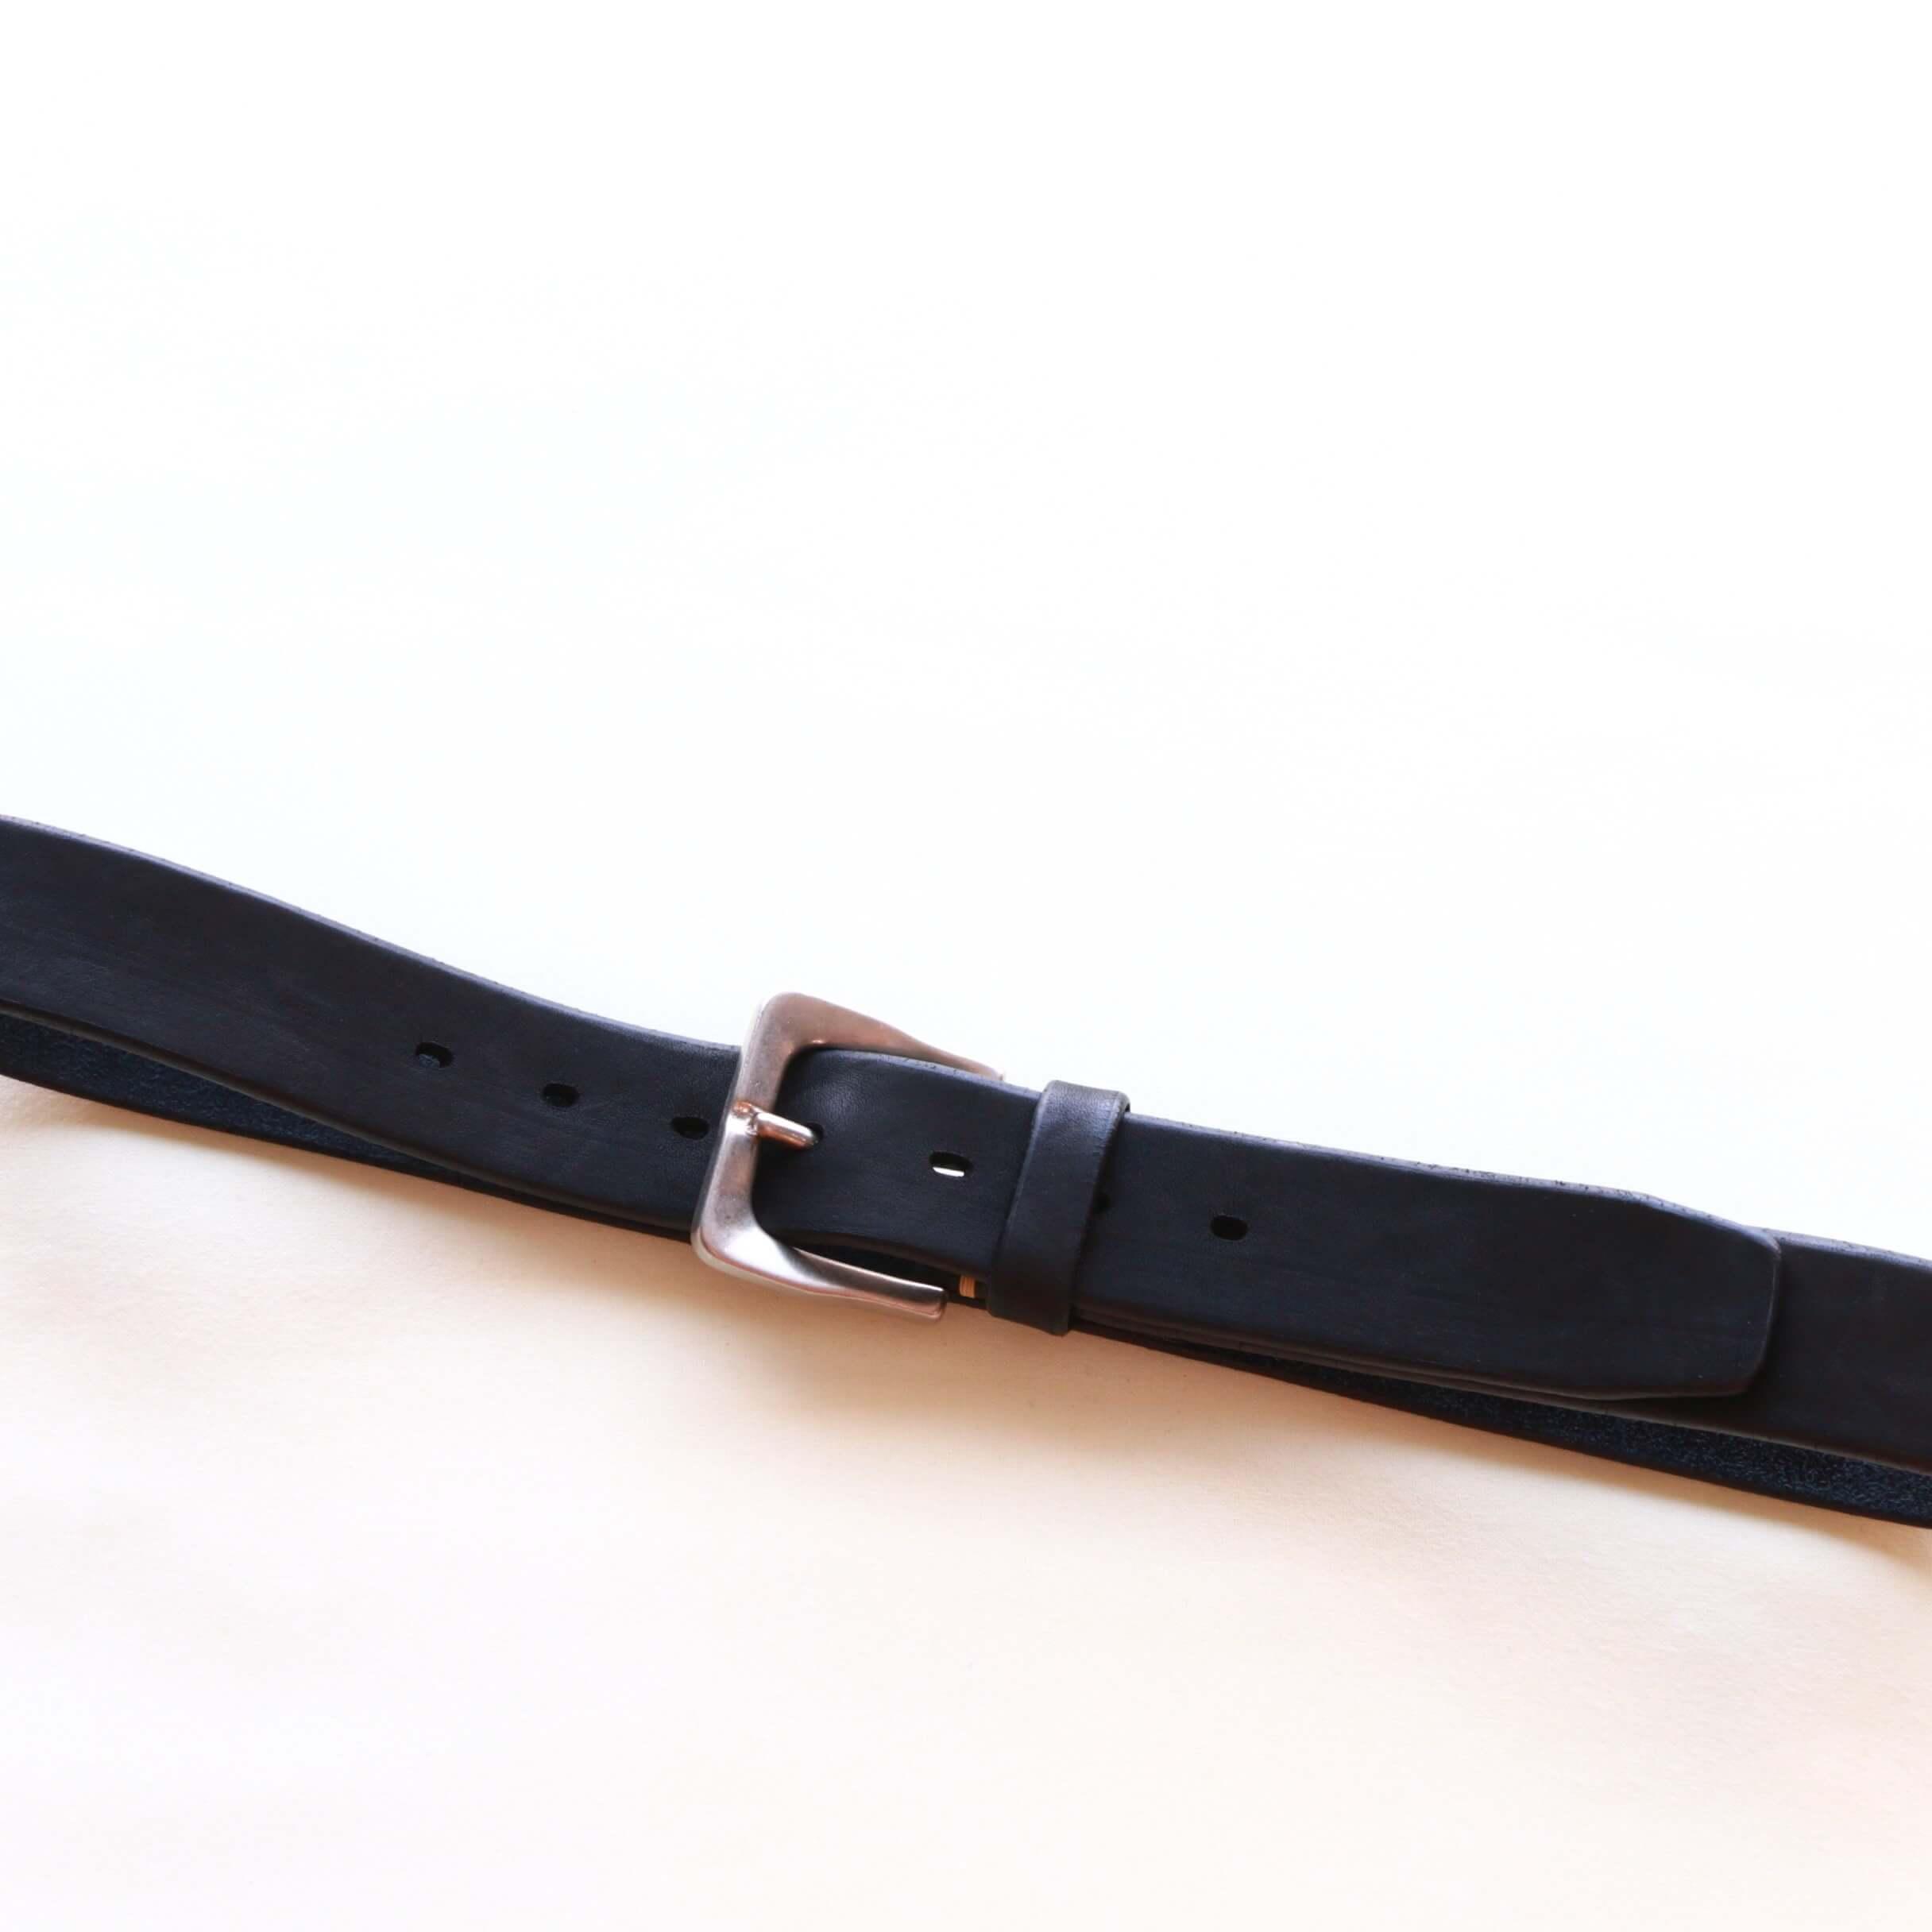 Vintage Works ヴィンテージワークス Leather belt レザーベルト DH5662